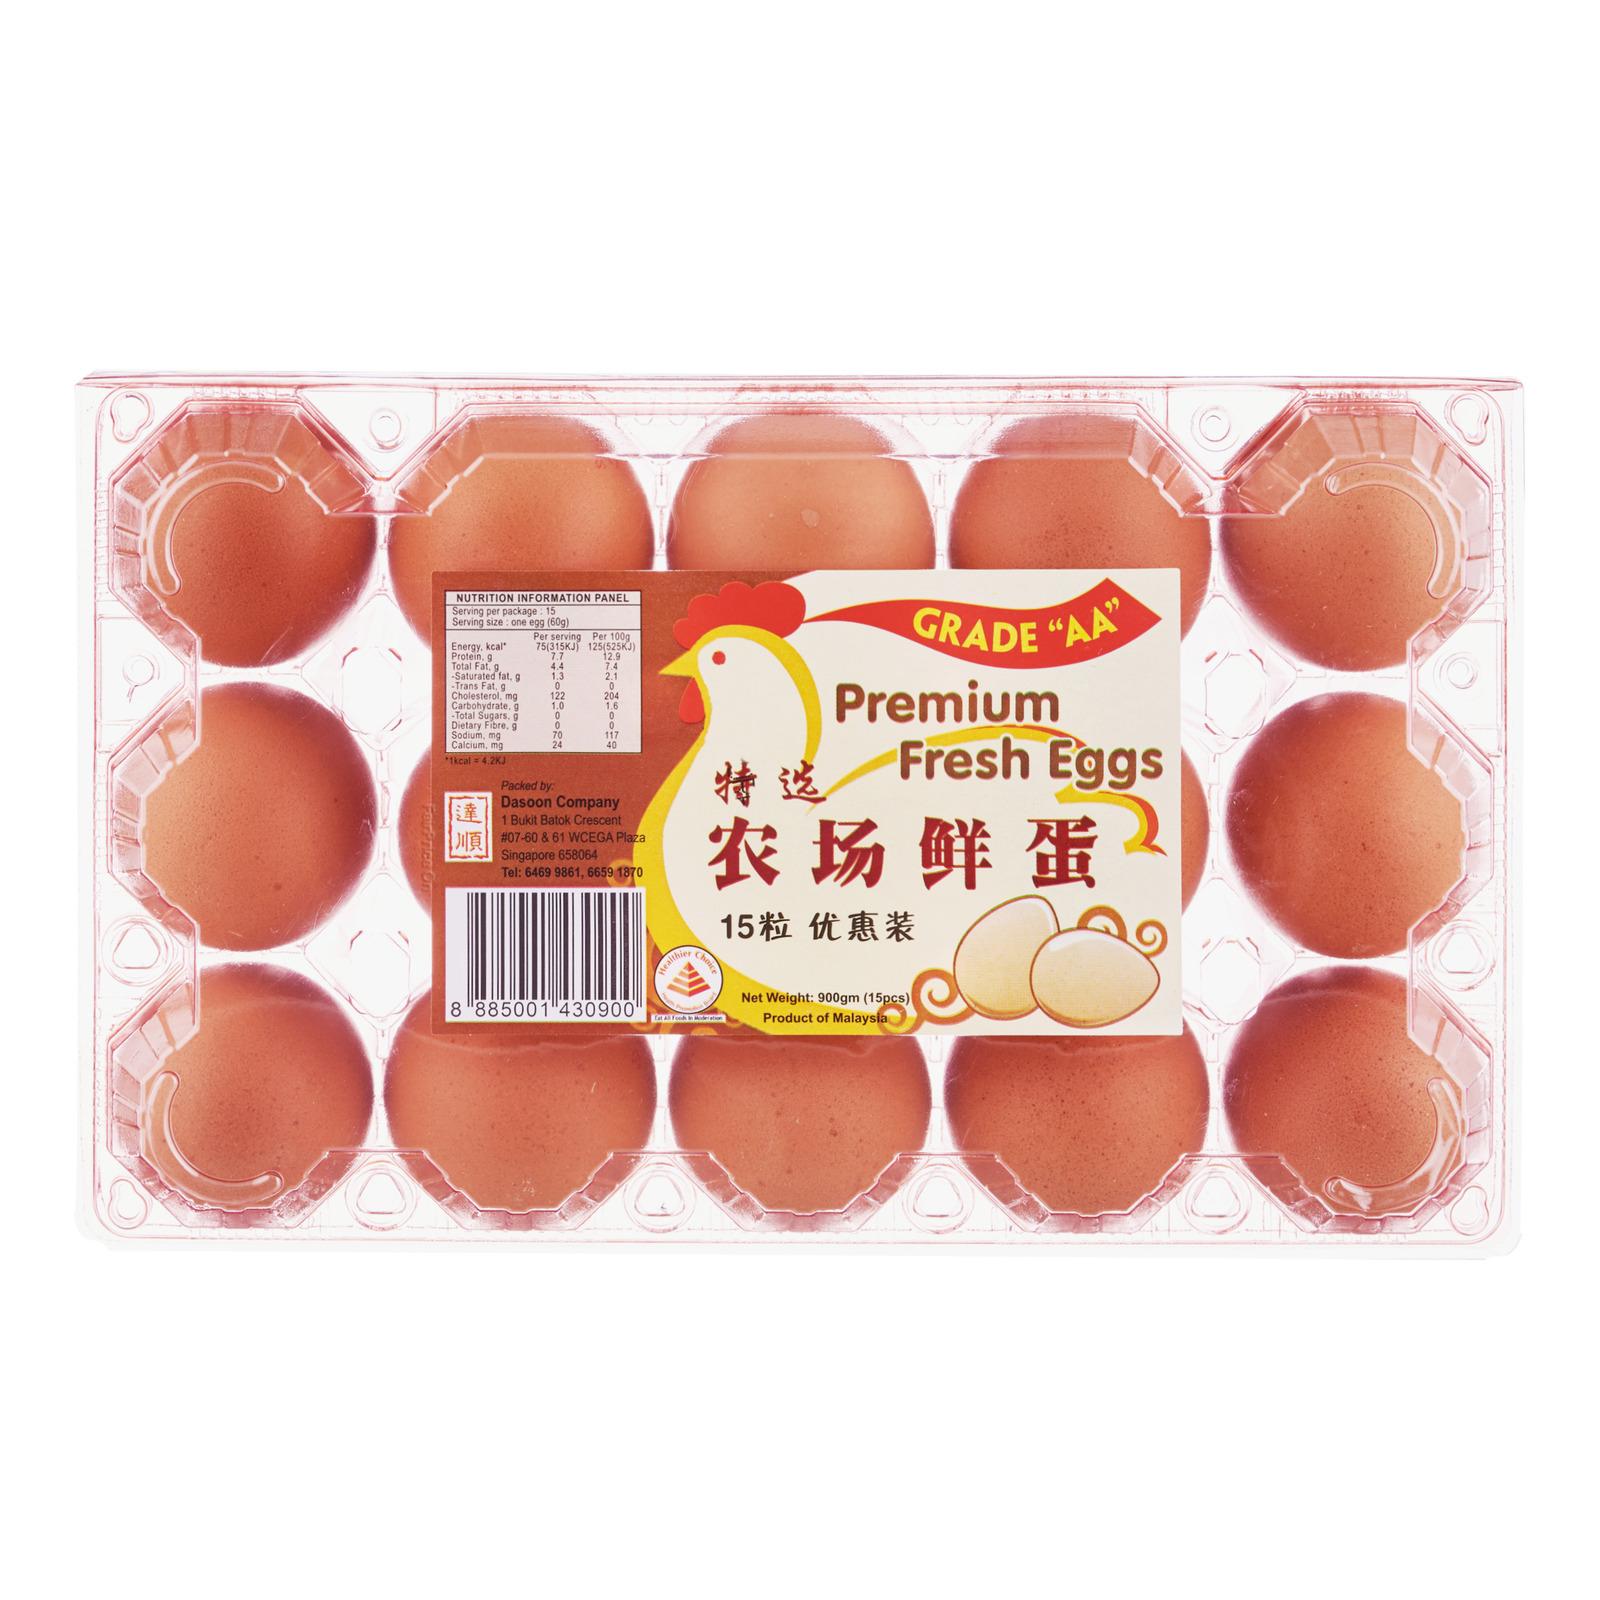 Dasoon Premium Fresh Eggs